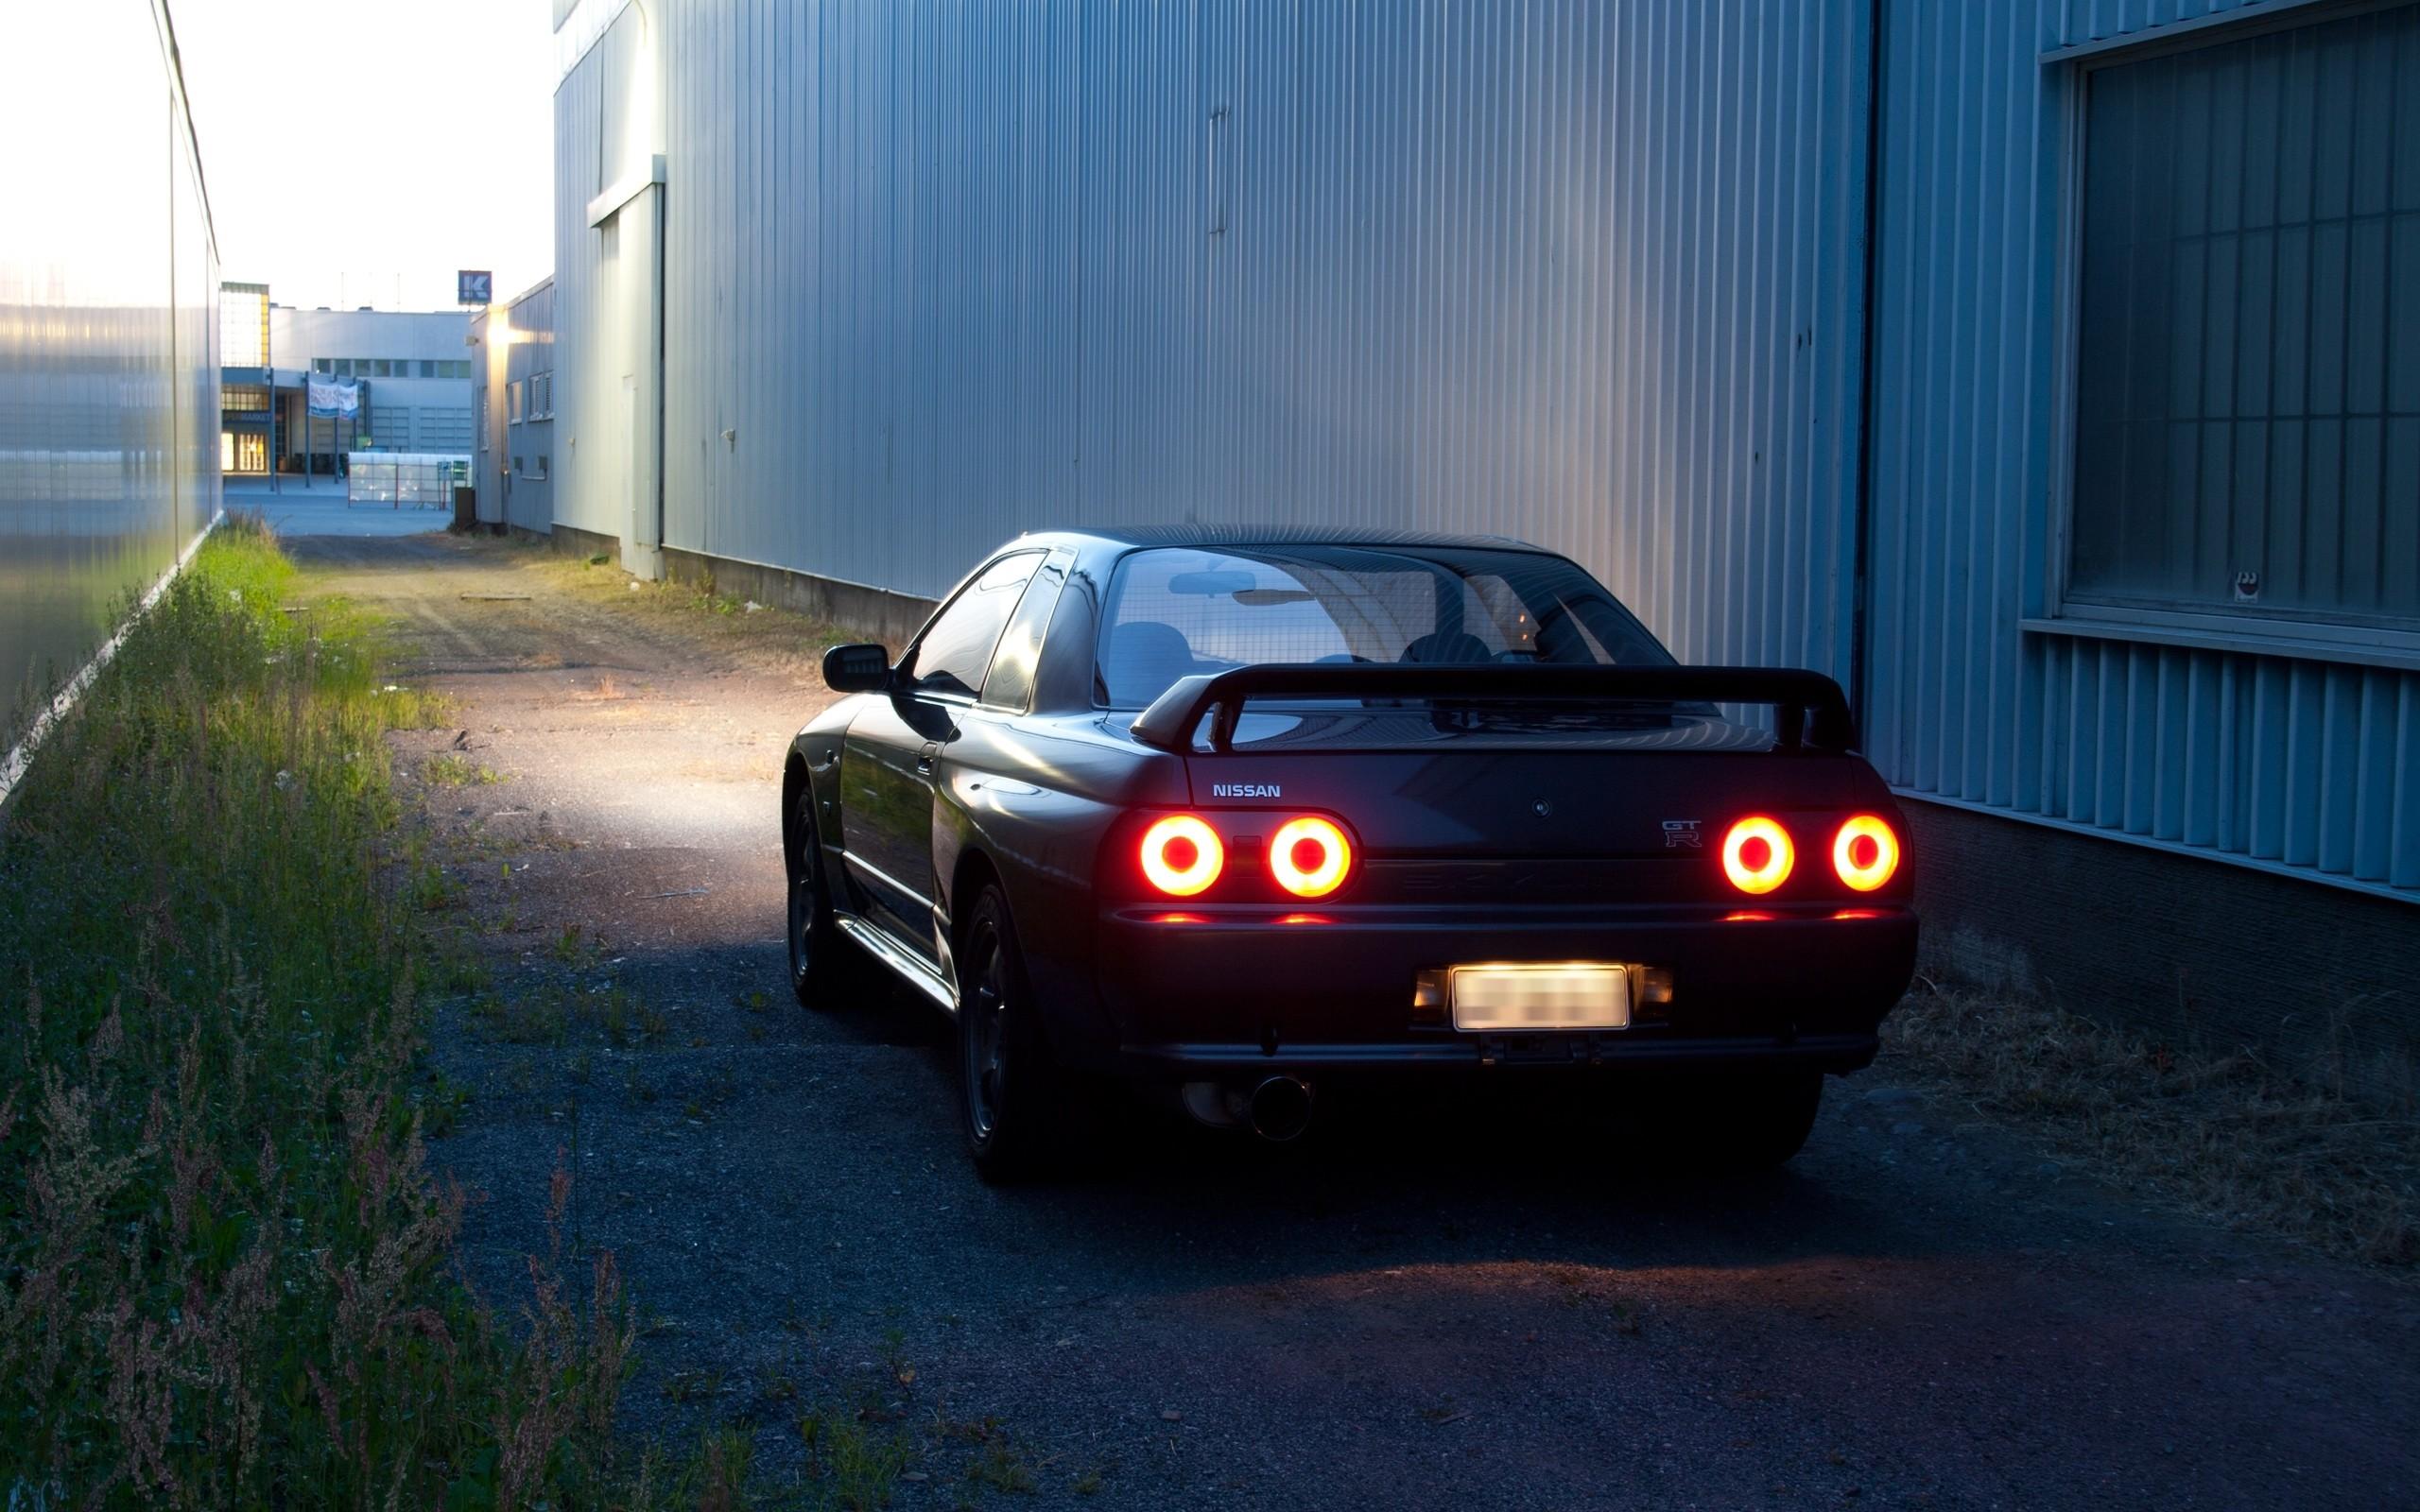 Exceptionnel 1920x1080 Nissan Skyline Gtr   YouTube